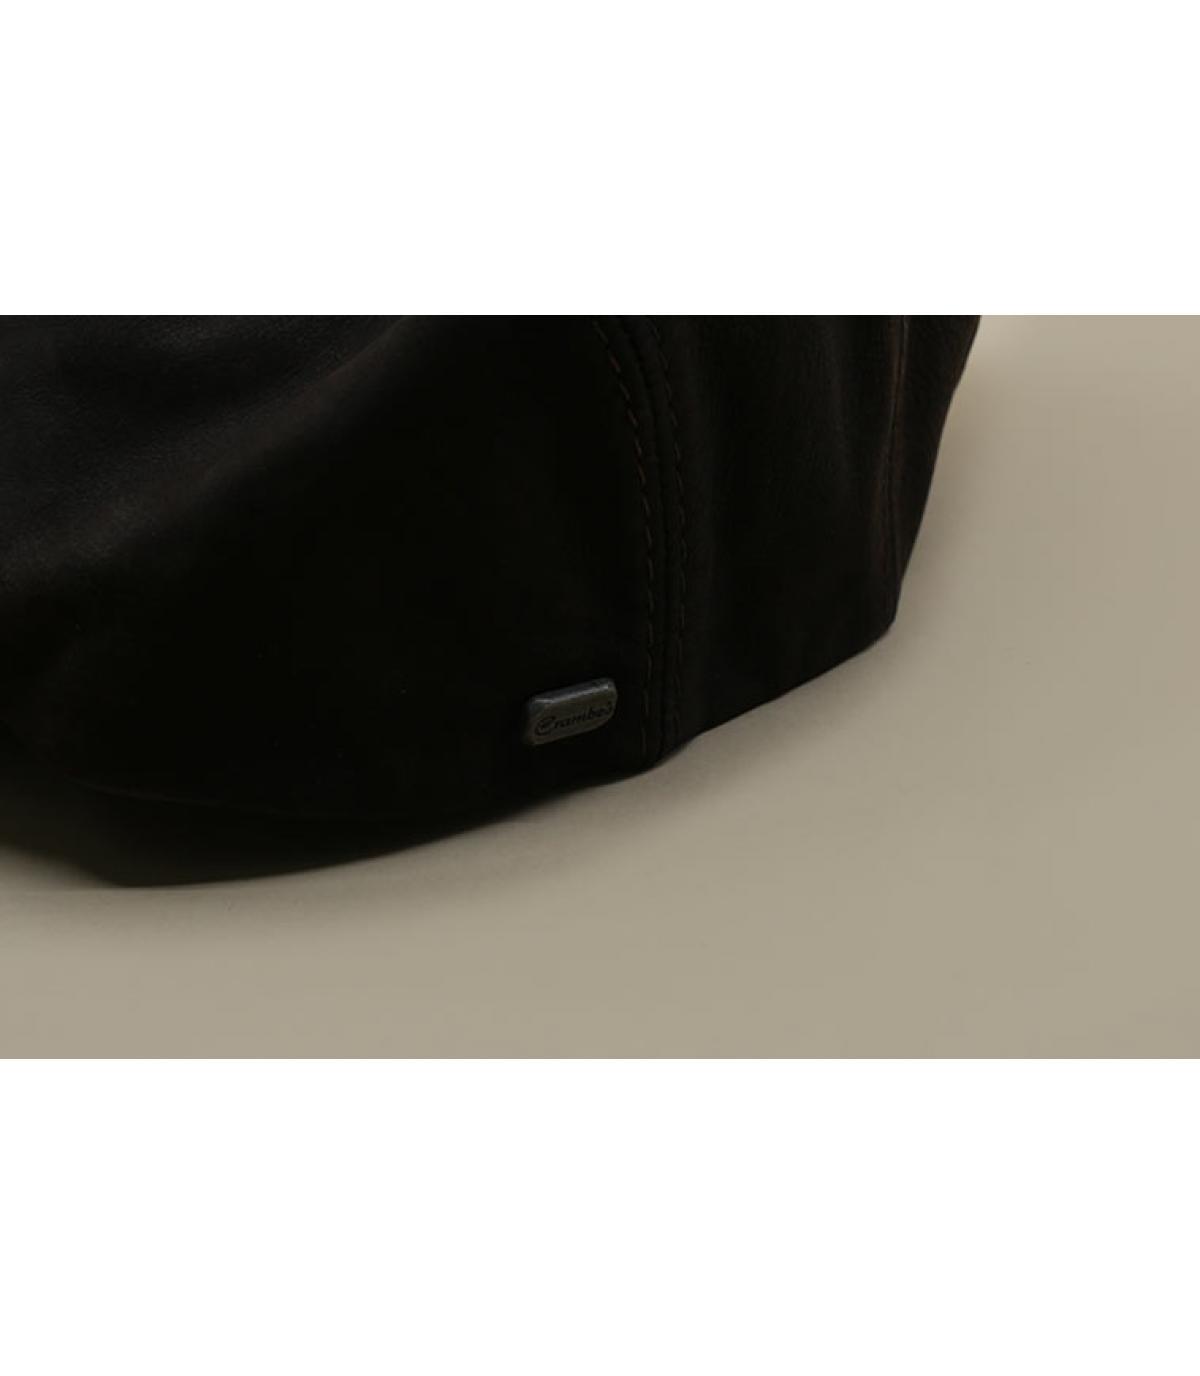 Details Daffy Cuir Nappa Wax braun - Abbildung 3